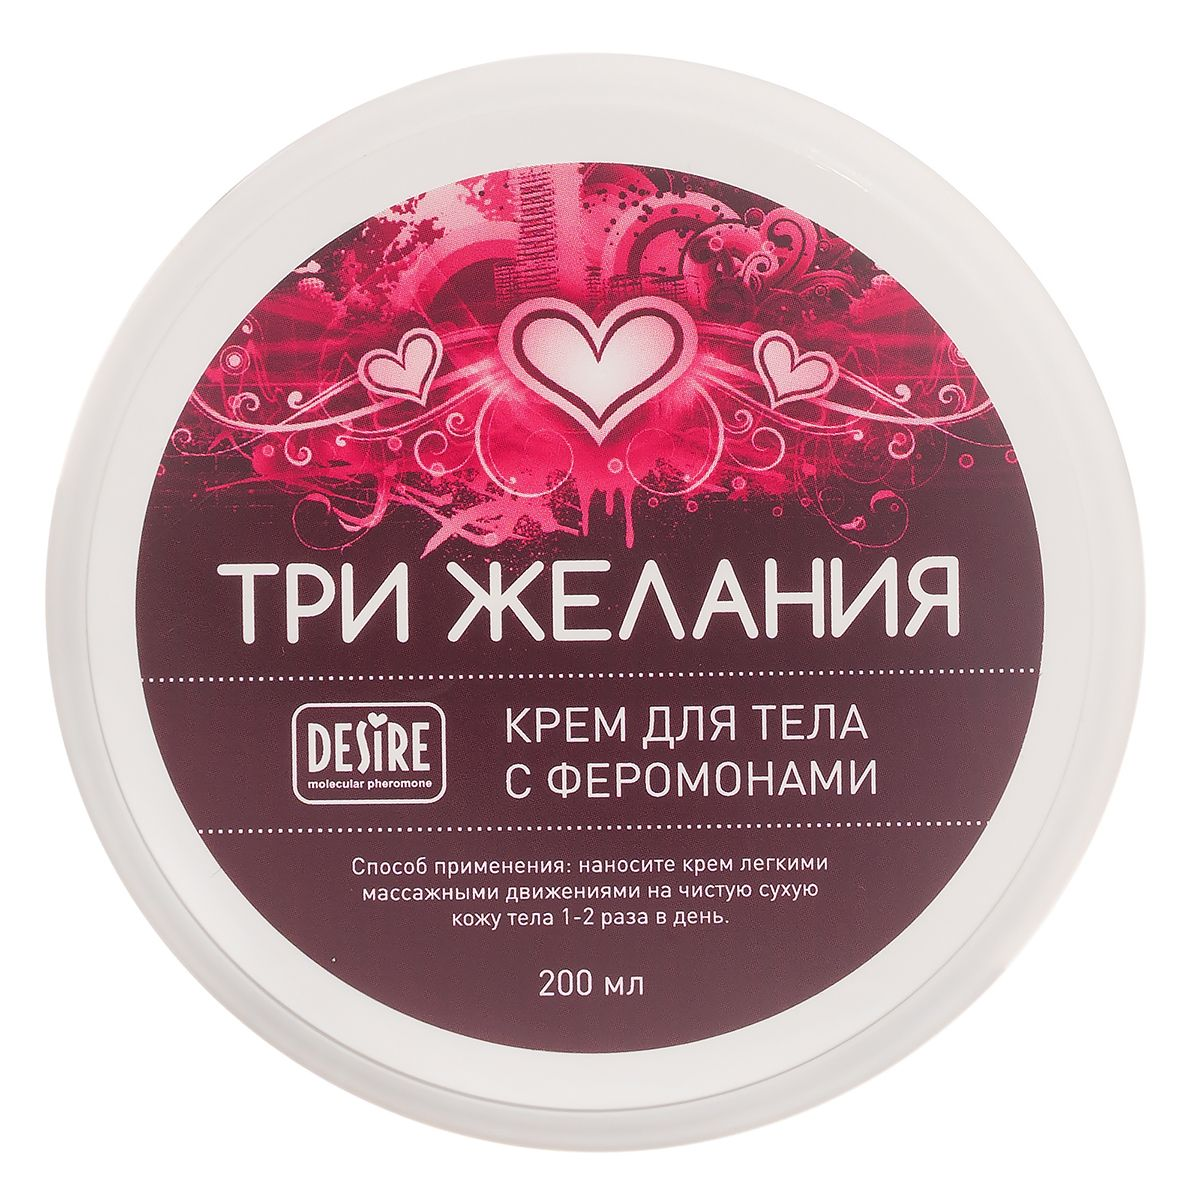 Увлажняющий крем для тела с феромонами «Три желания» - 200 мл.-